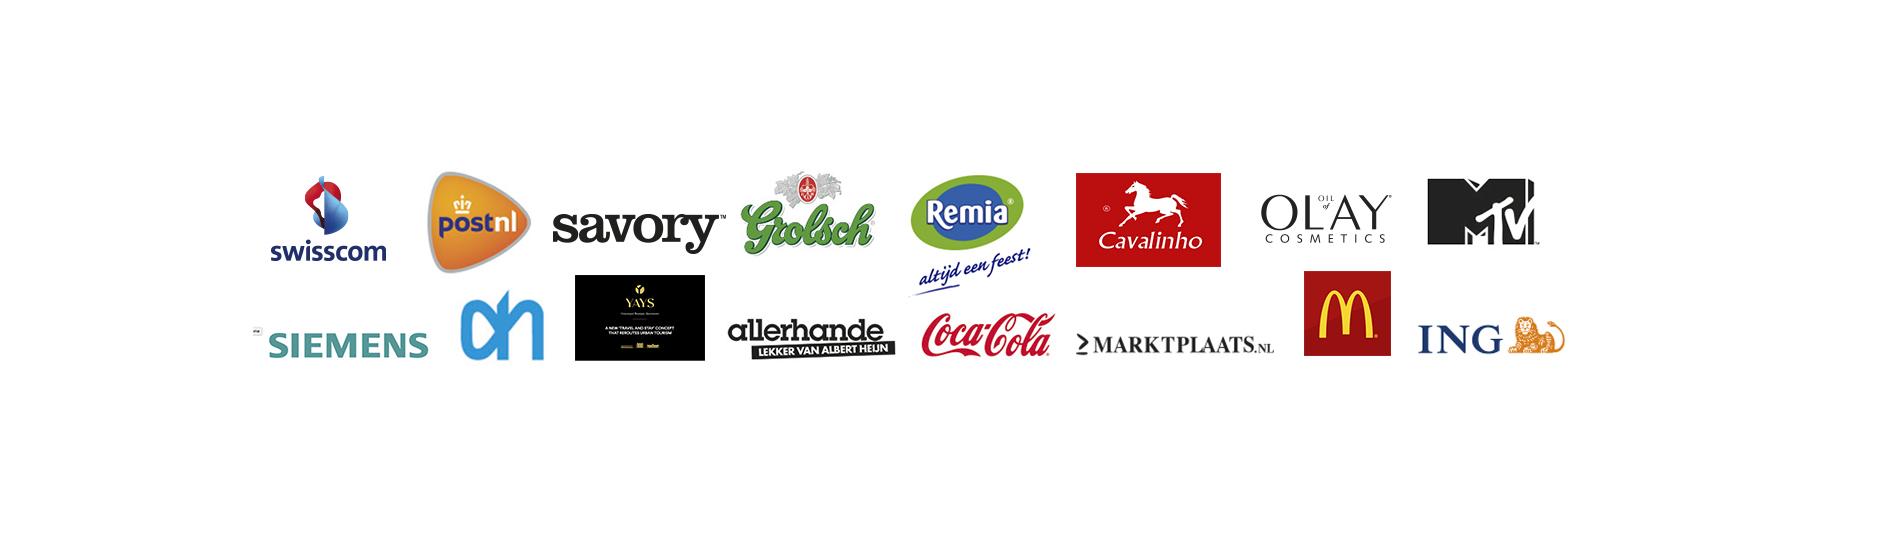 Liquidcake, Clients, foodfilms, siemens, remia, olay, mtv ing, coca cola, albert heijn, grolsch